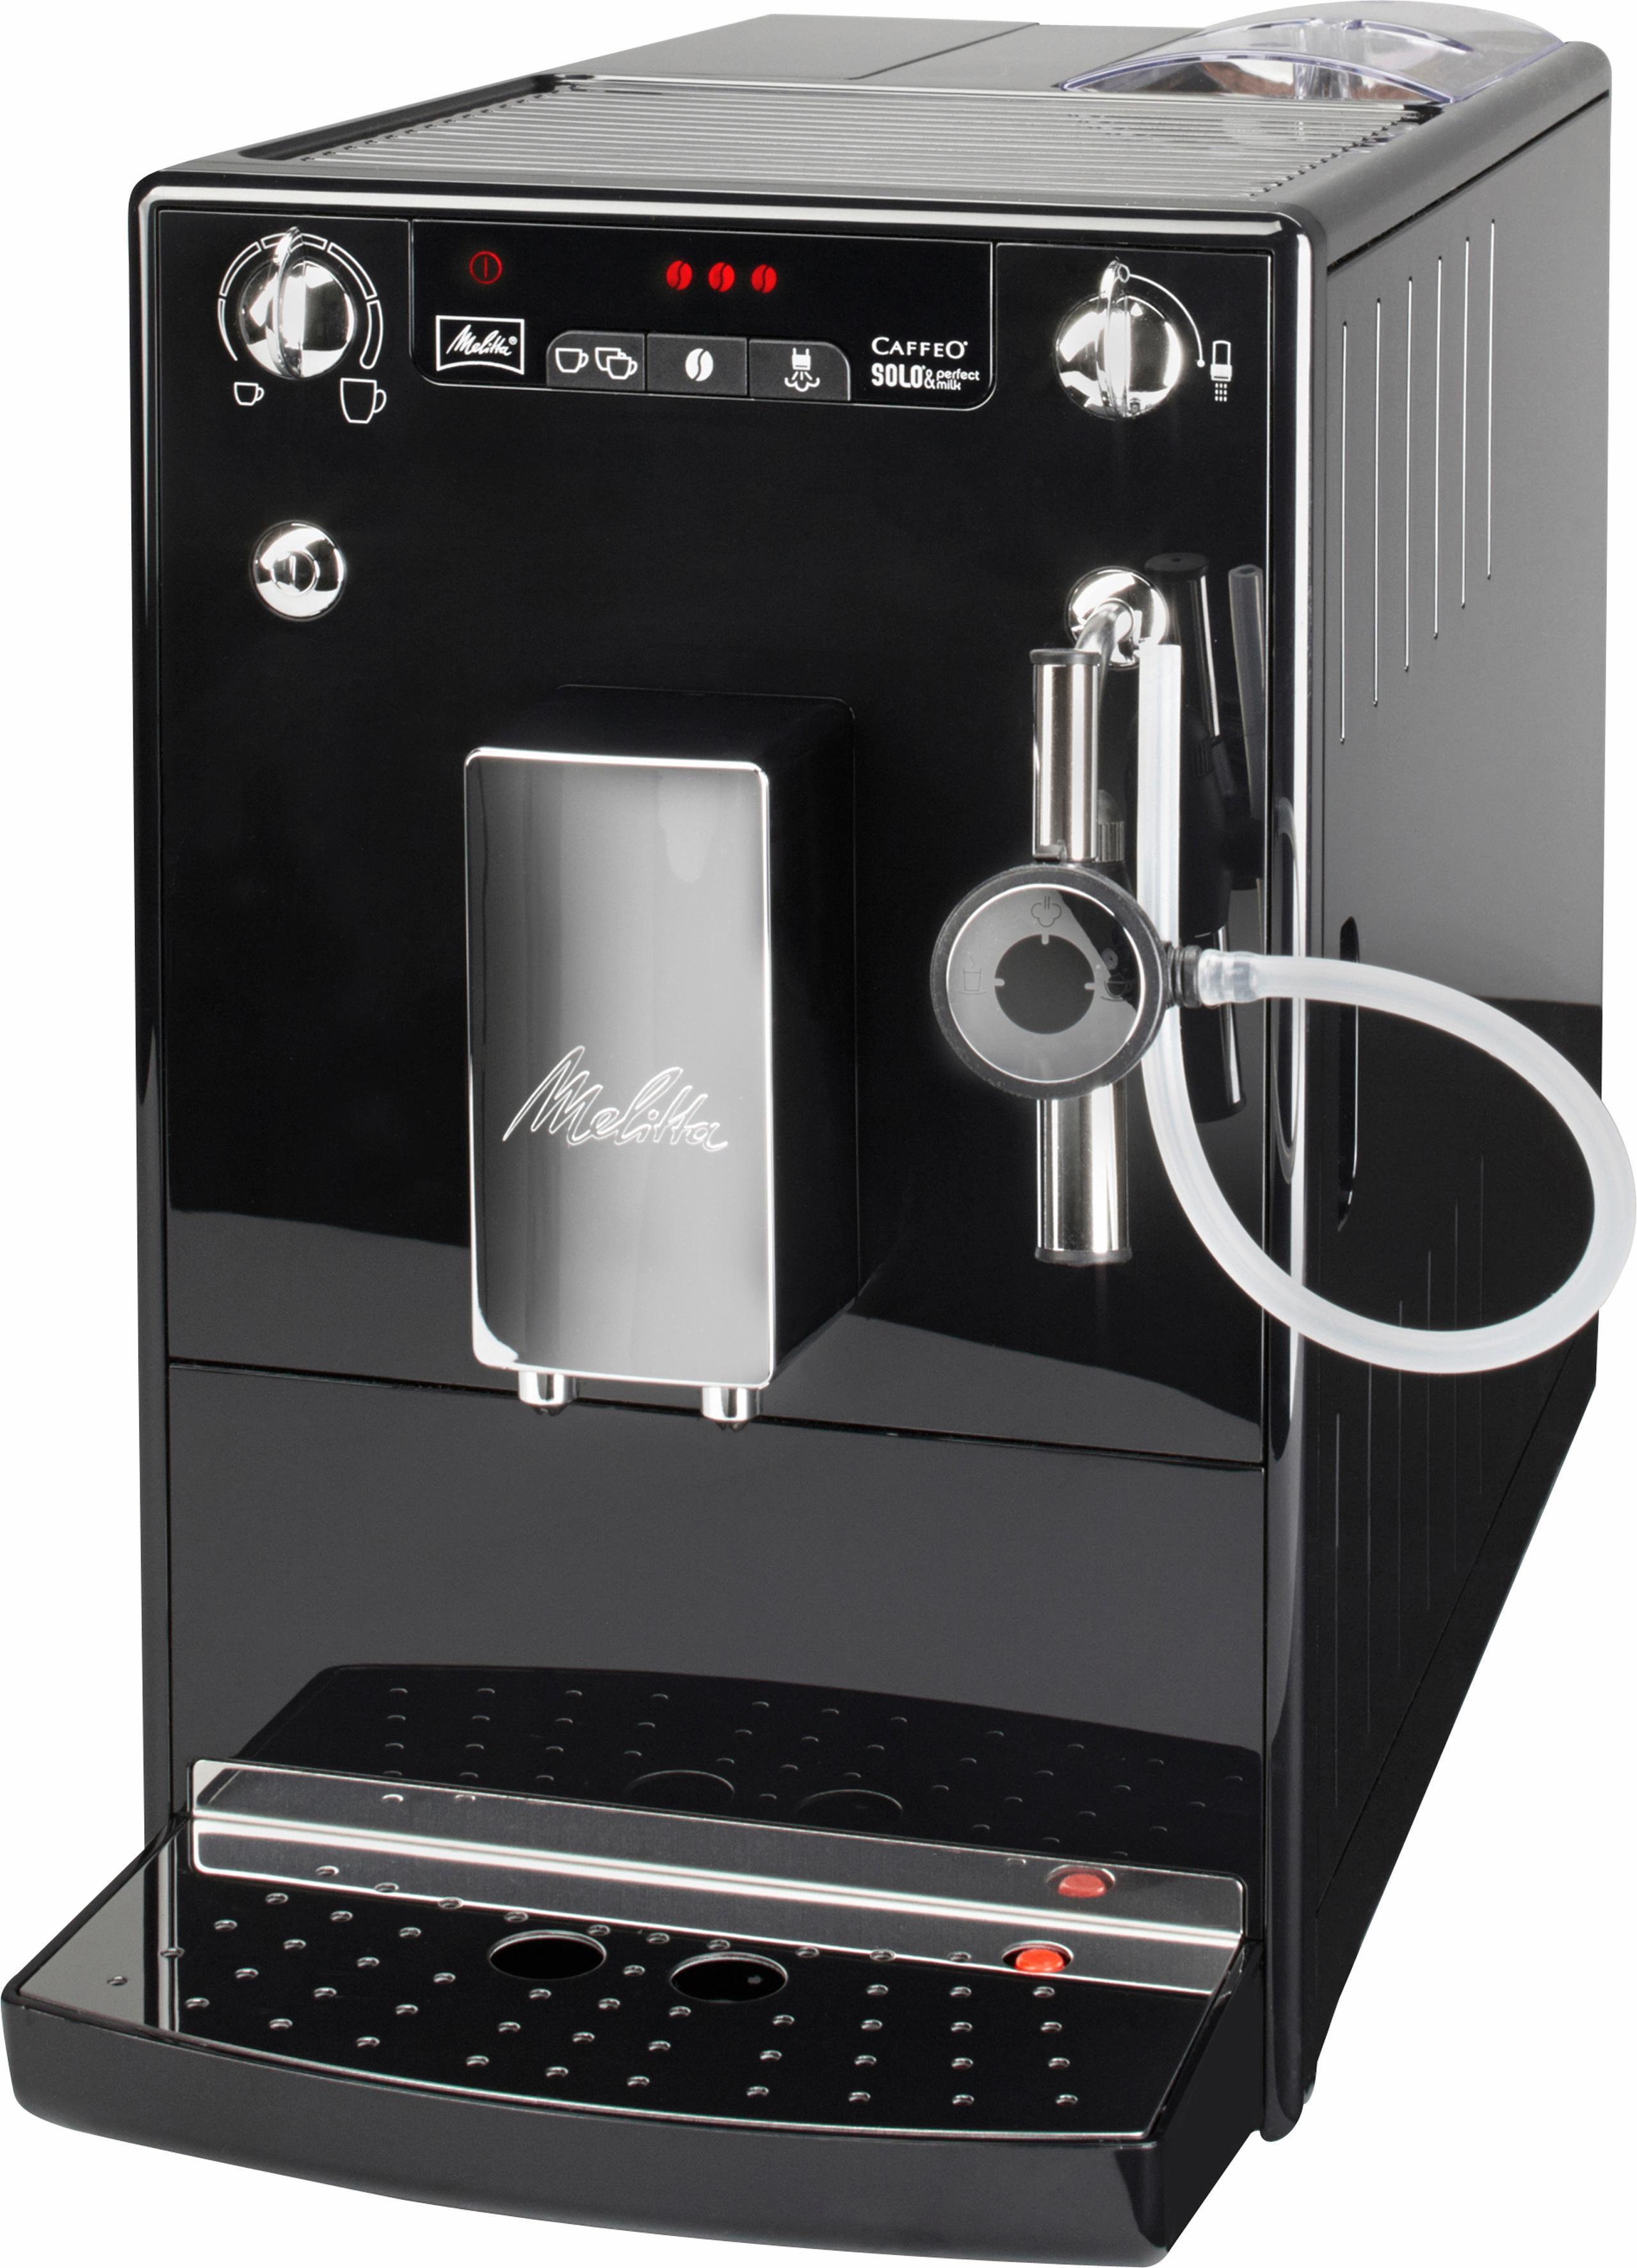 Melitta Kaffeevollautomat CAFFEO® Solo® & Perfect Milk E 957-101, 1, 2l Tank, Kegelmahlwerk | Küche und Esszimmer > Kaffee und Tee > Kaffeevollautomaten | Melitta